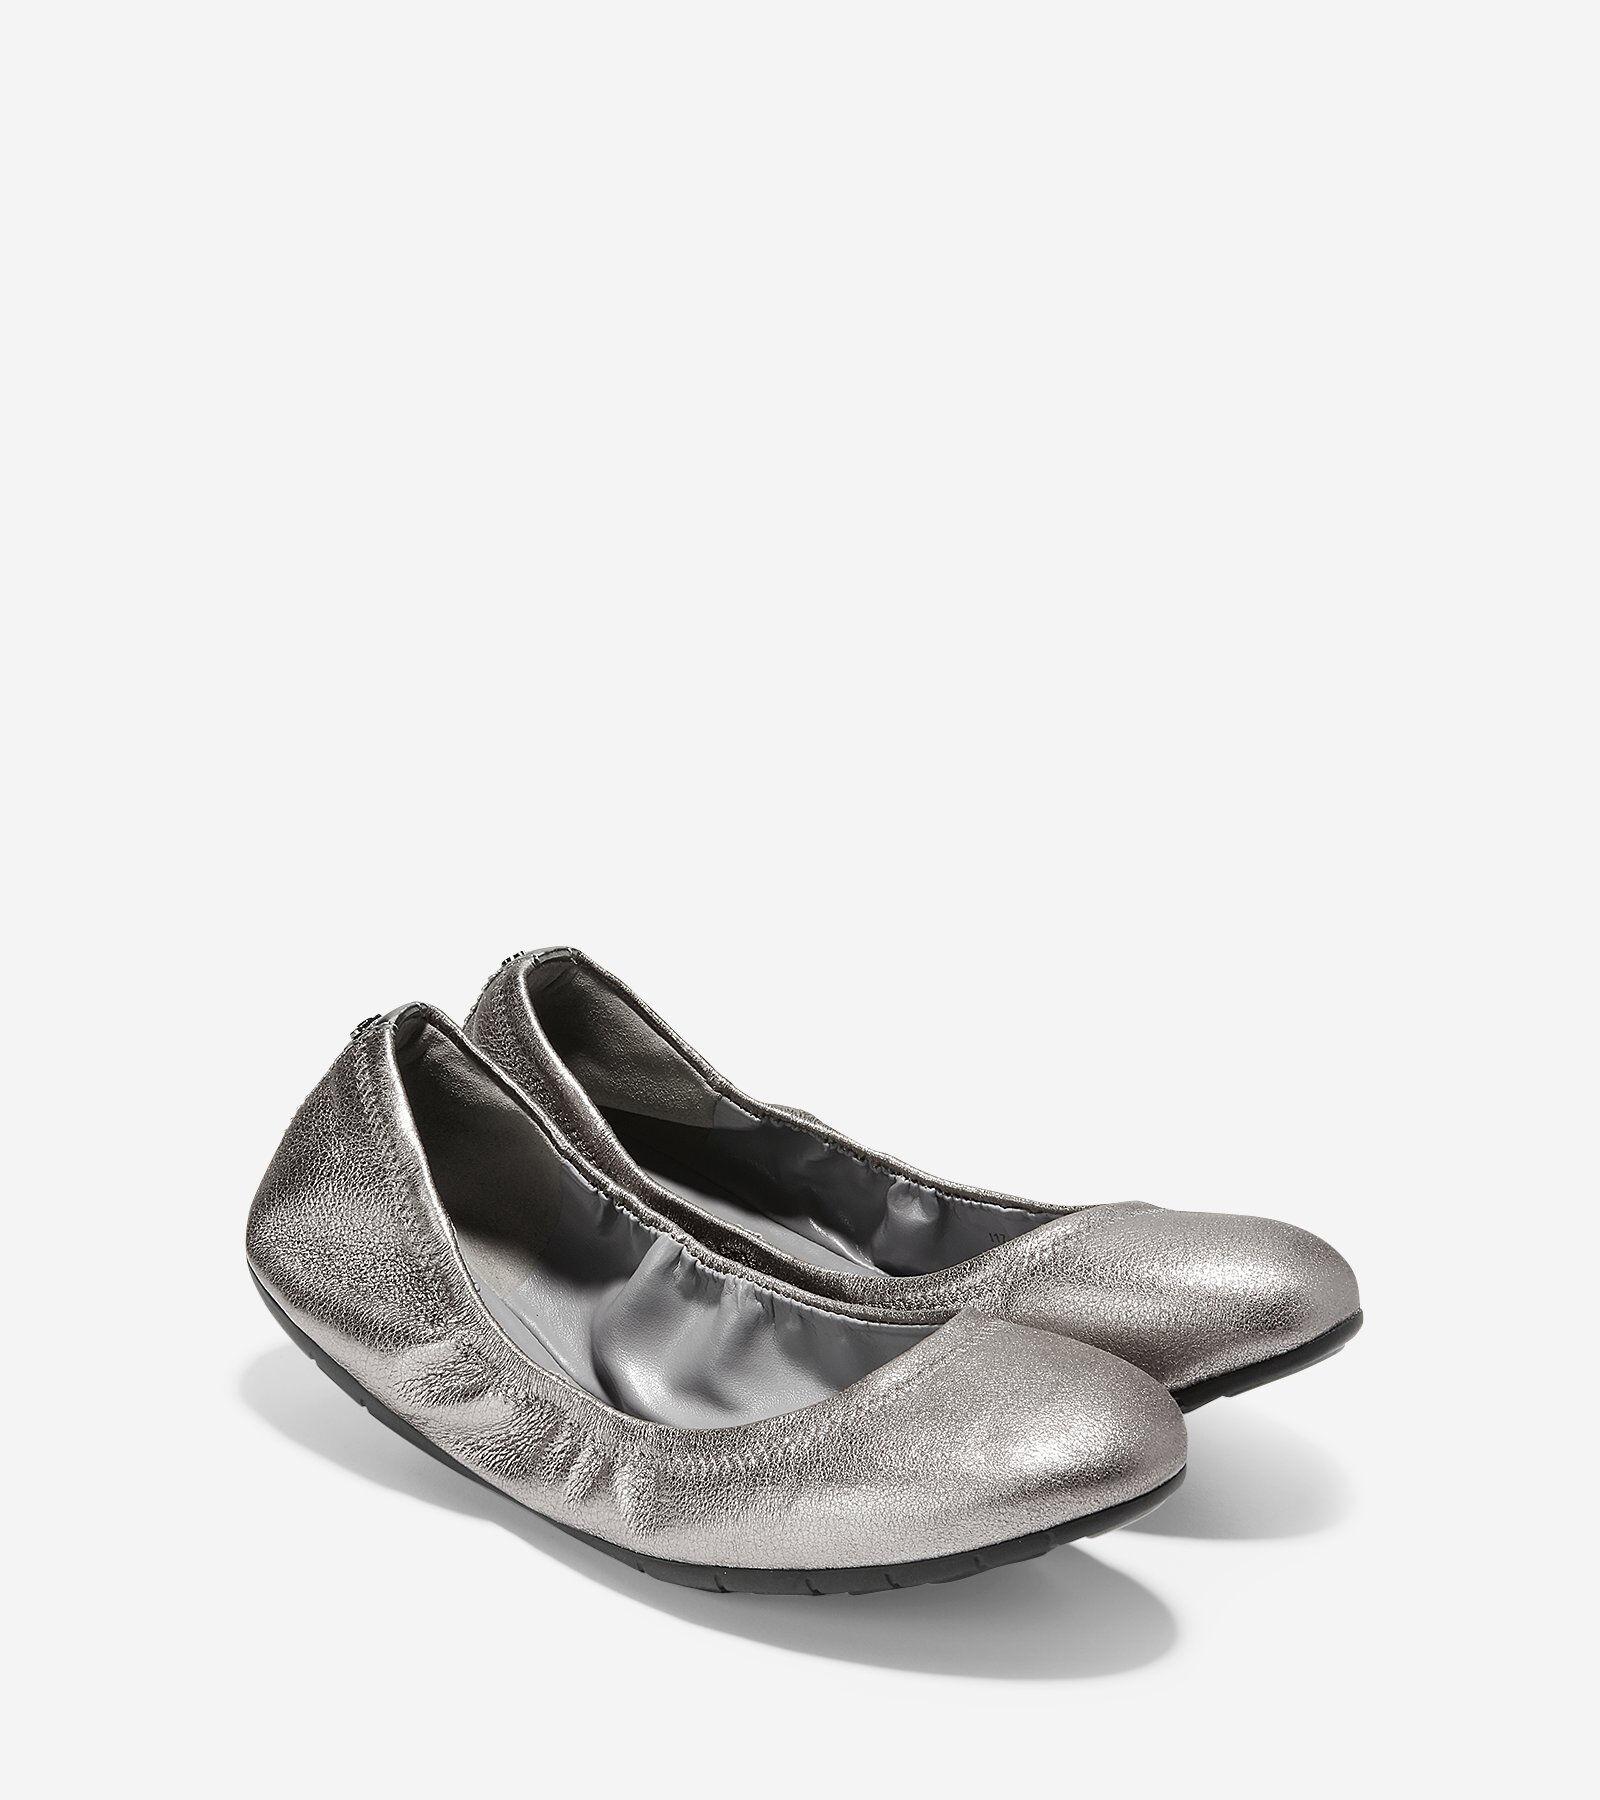 Womens Zerogrand Ballet Flat 7.5 Gunmetal Shimmer Cole Haan Online-Verkauf Online dgBpvAS